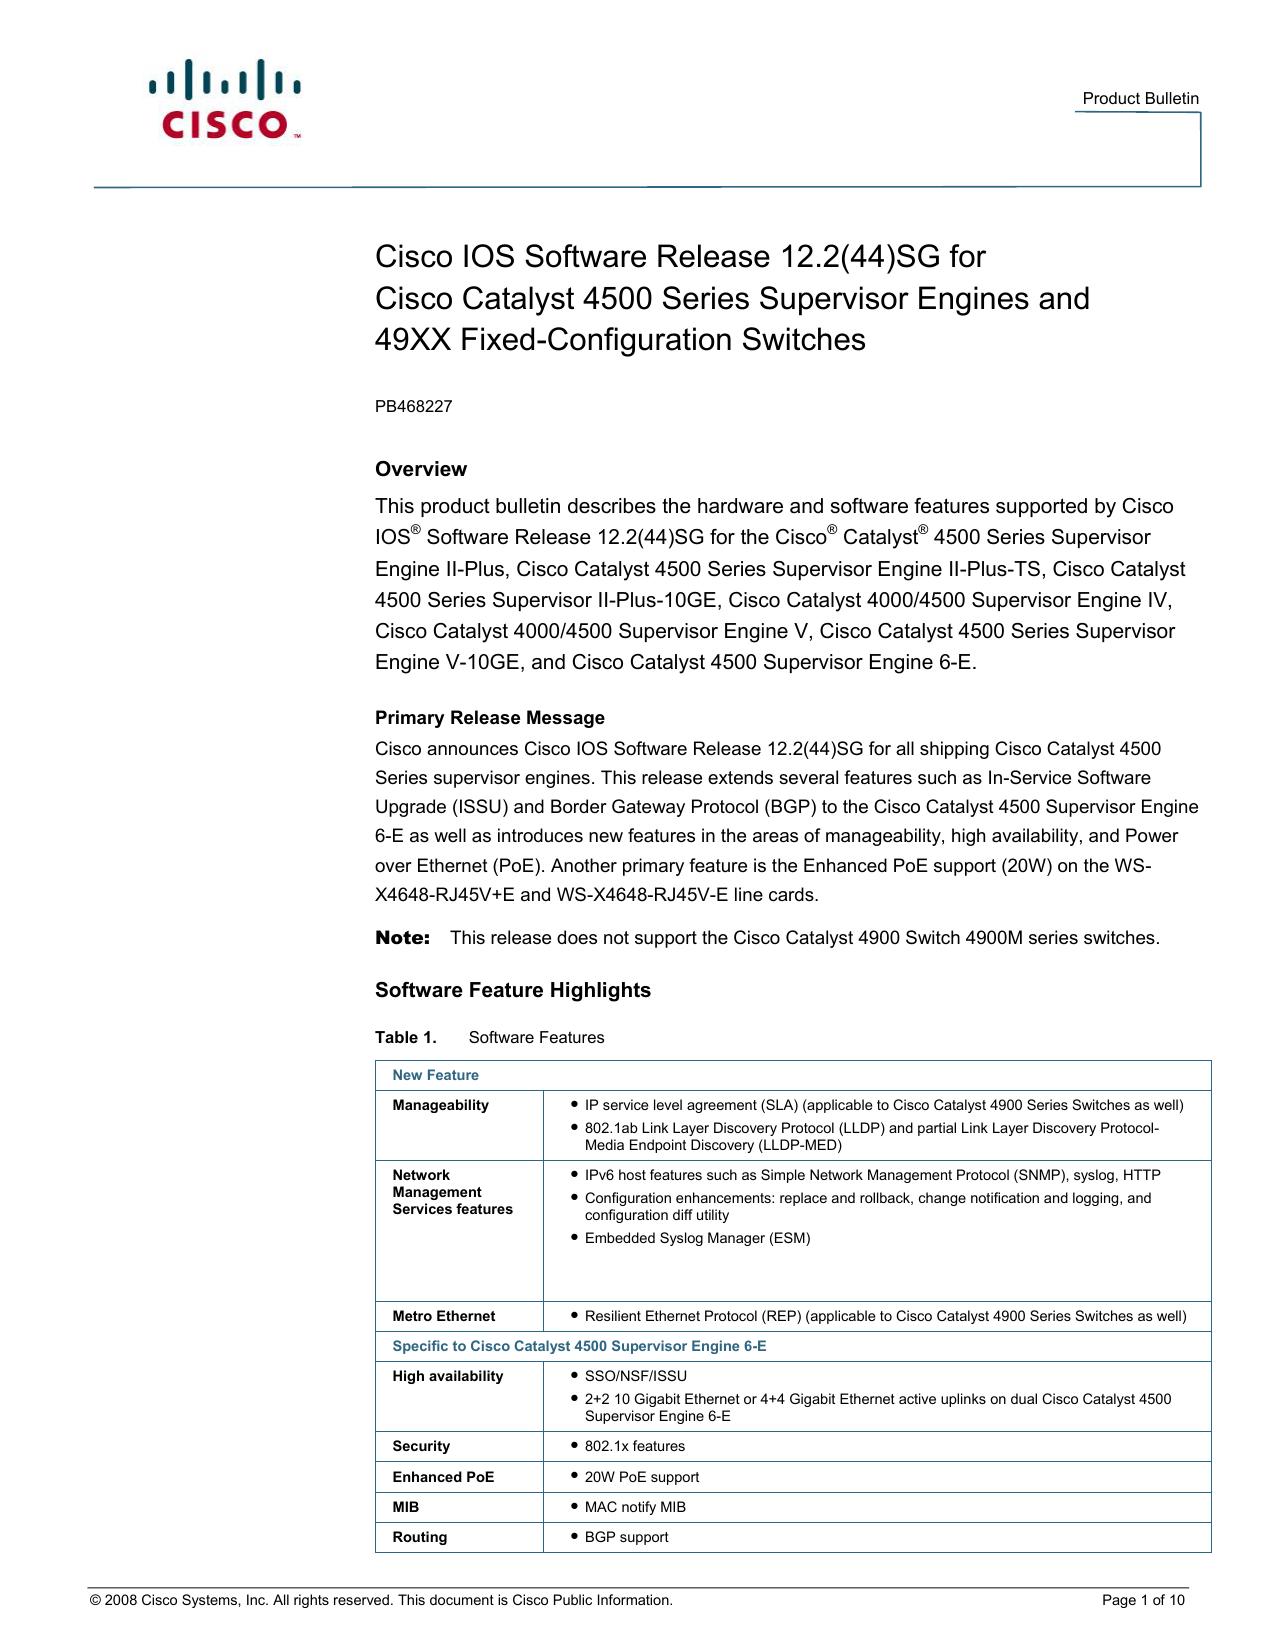 Cisco IOS Software Release 12 2(44)SG for Cisco Catalyst